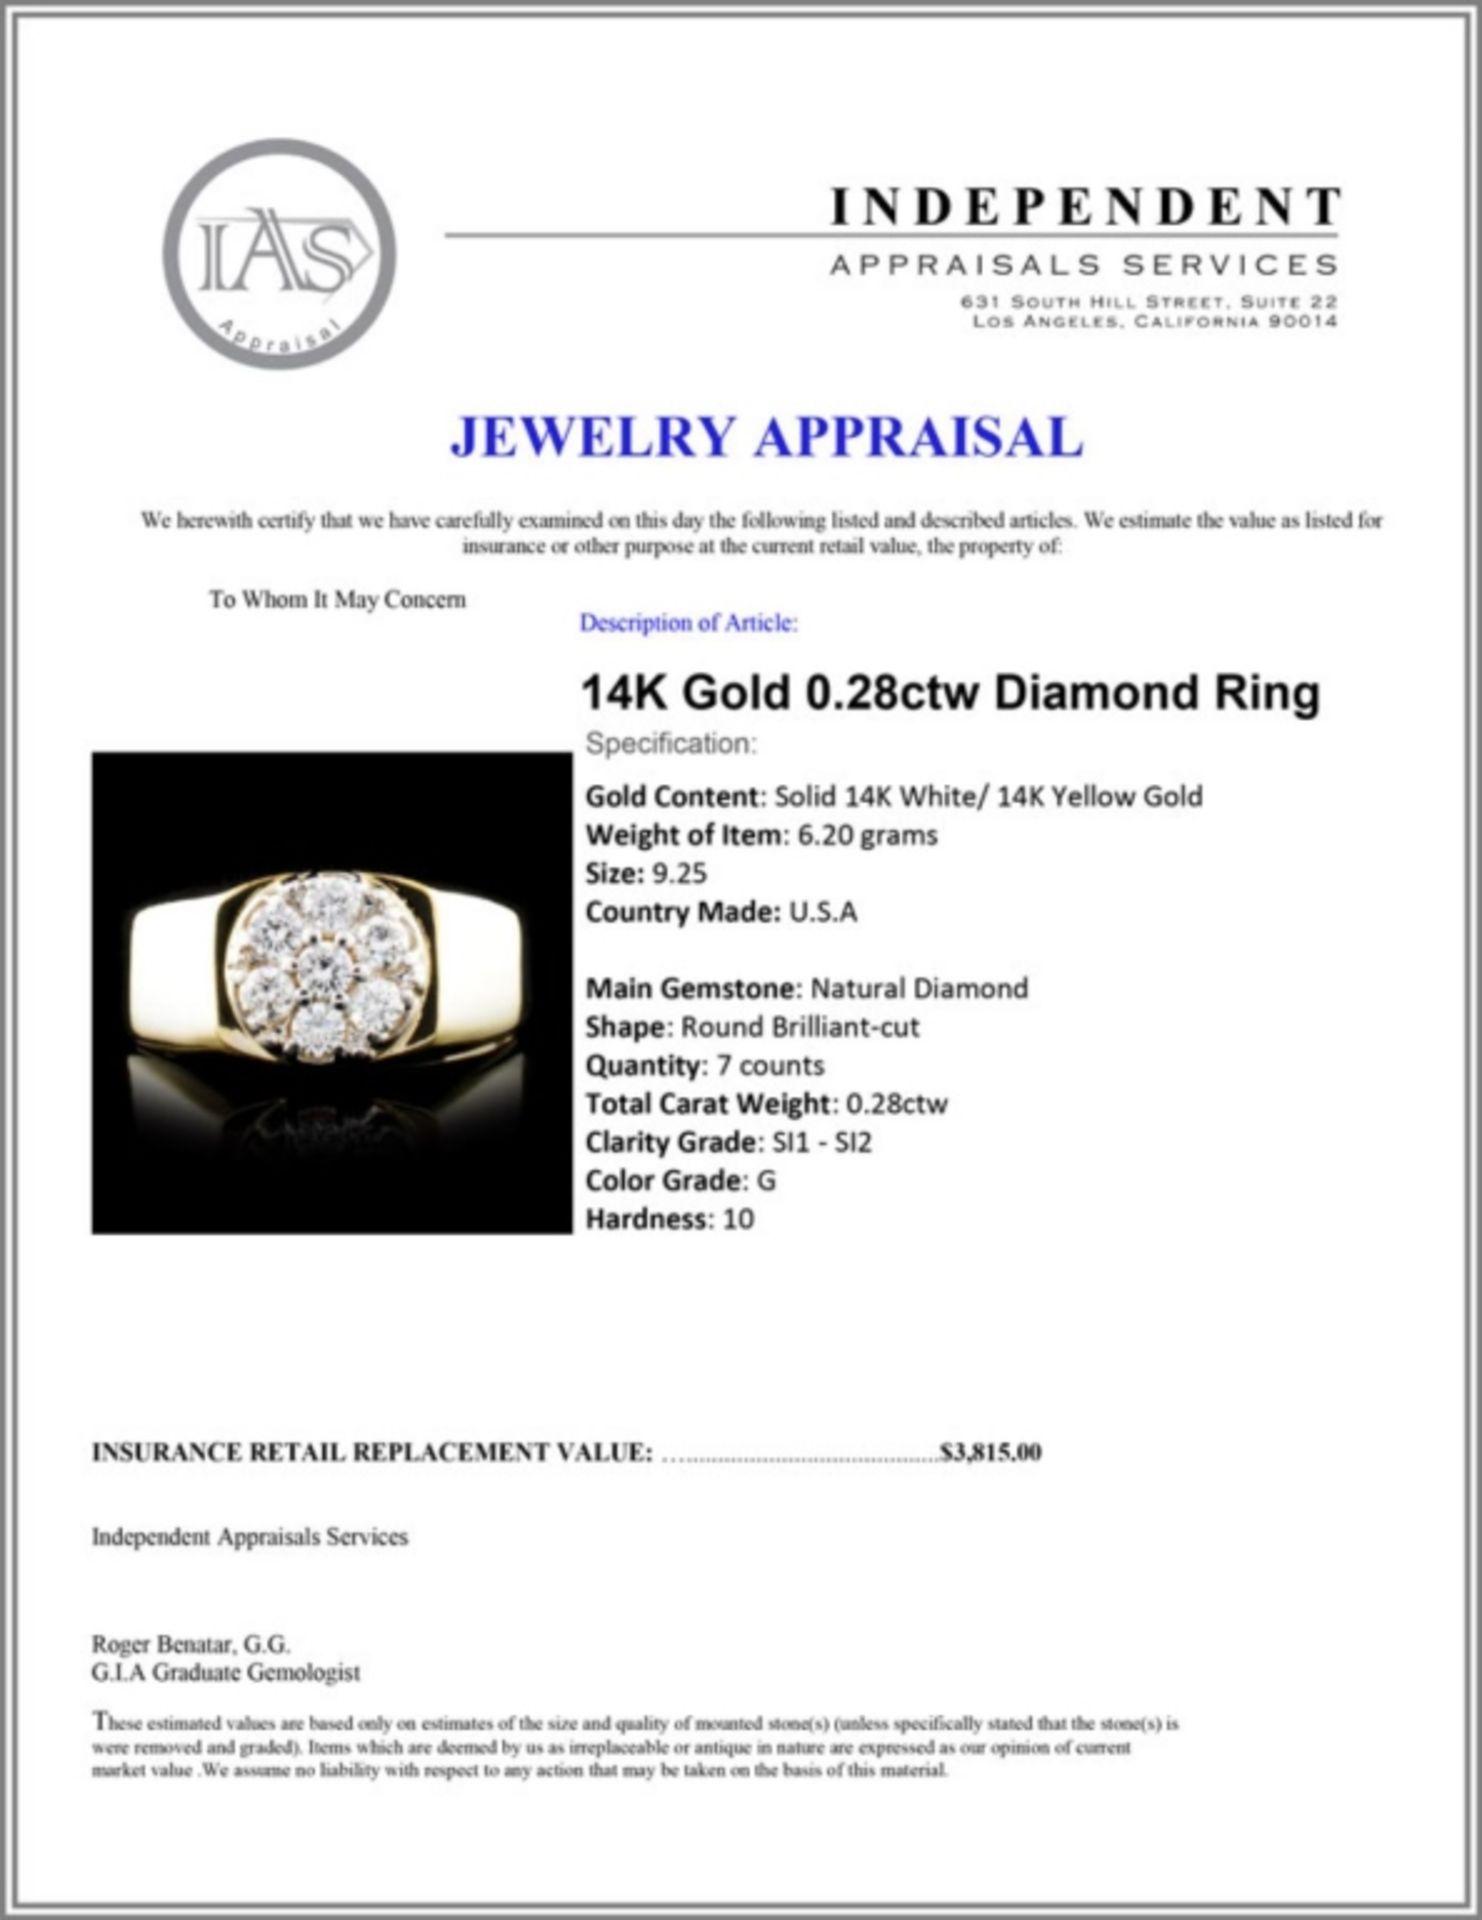 14K Gold 0.28ctw Diamond Ring - Image 5 of 5